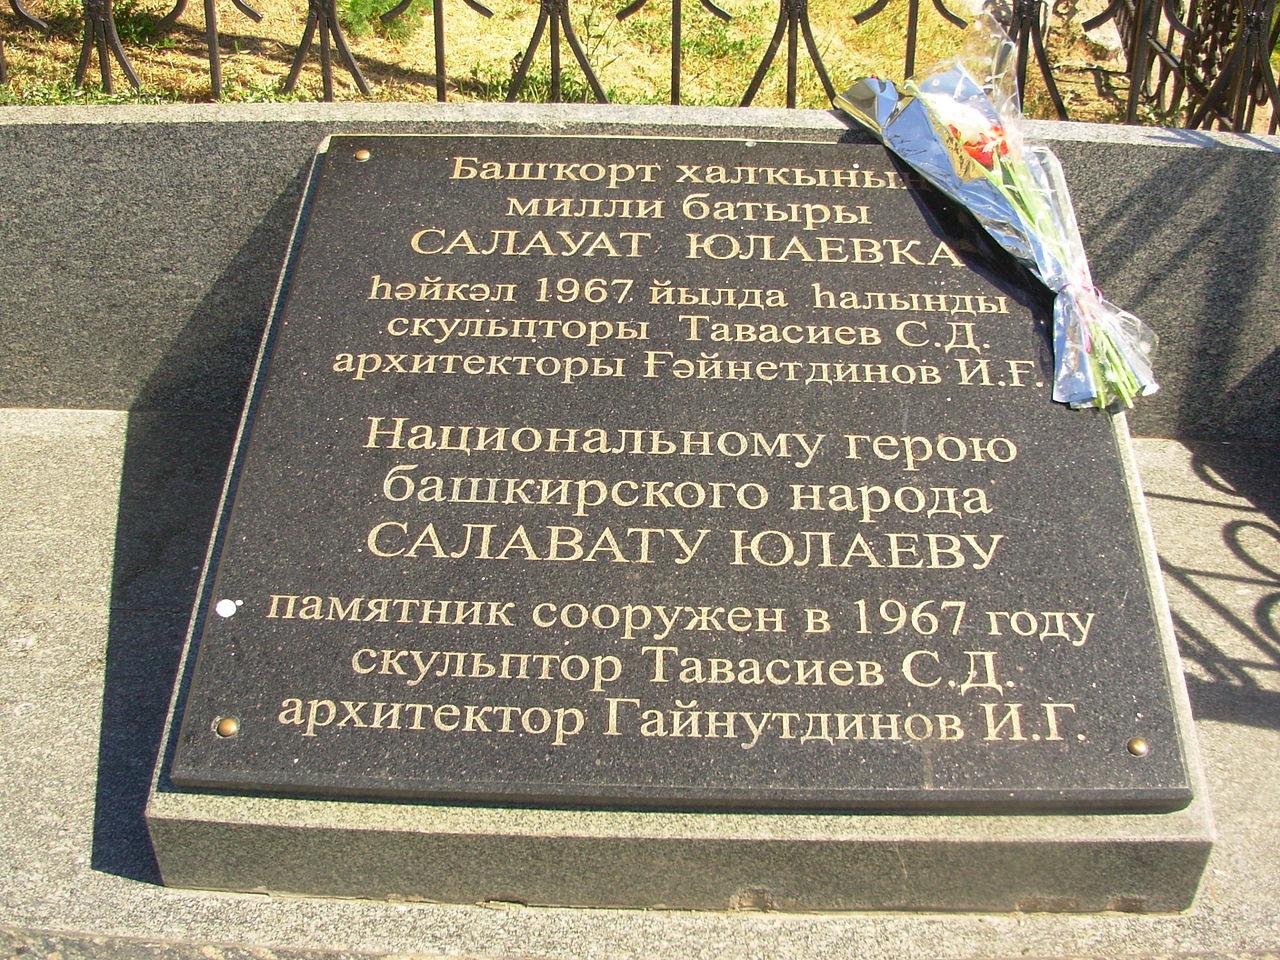 Памятник Салавату Юлаеву, мемориальная плита